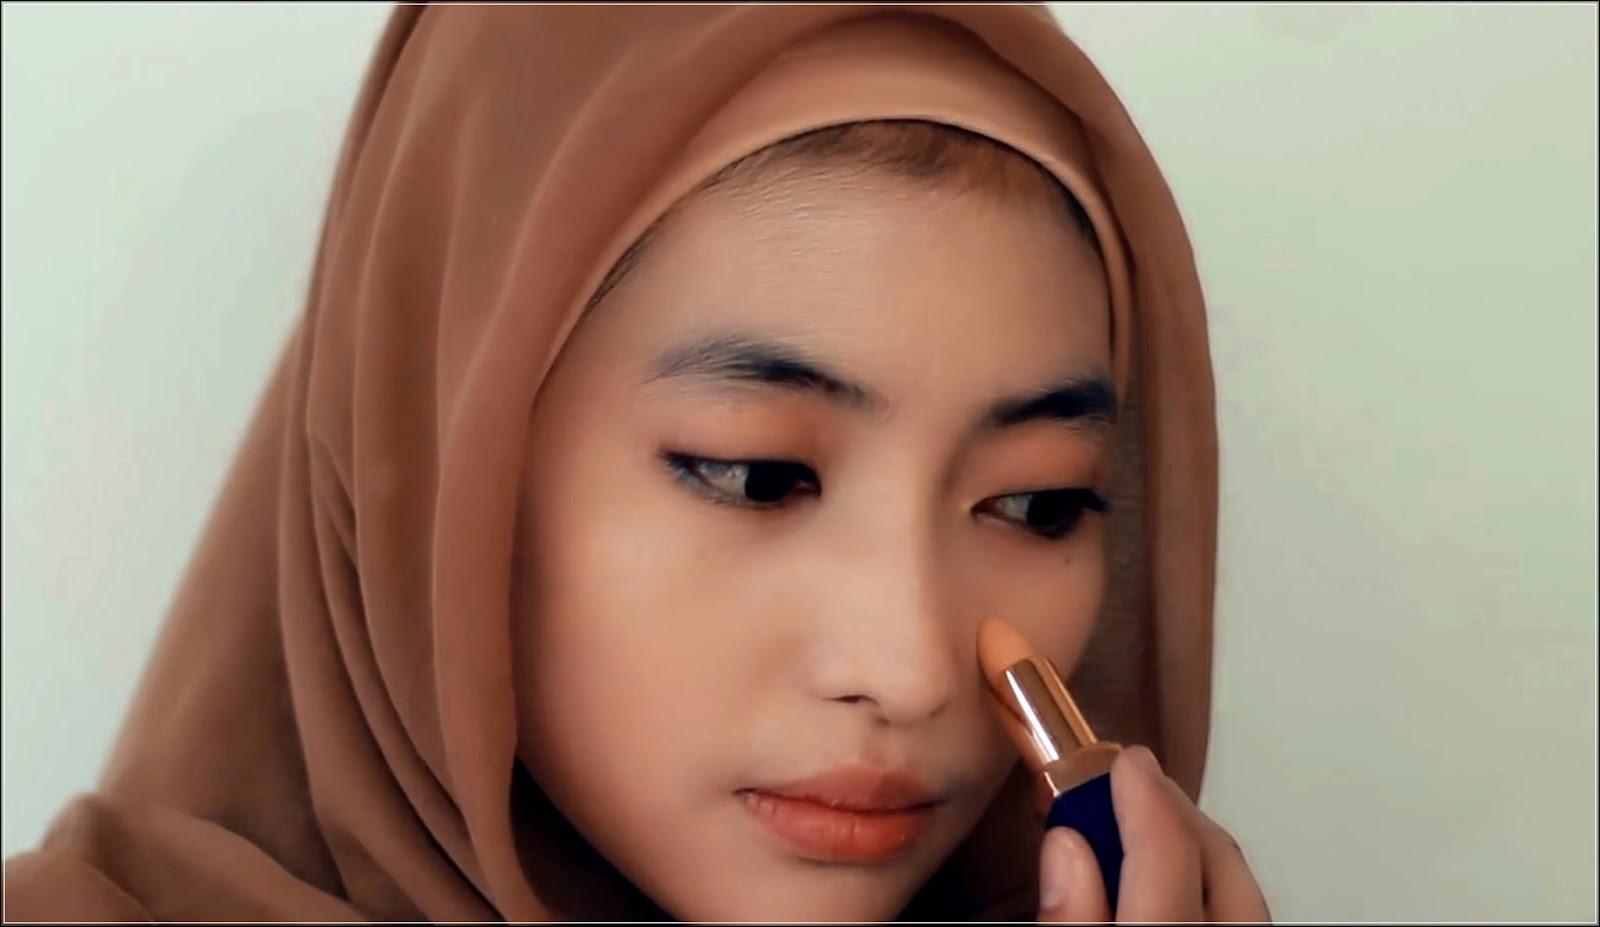 Gunakan Make Up pada Area Bibir